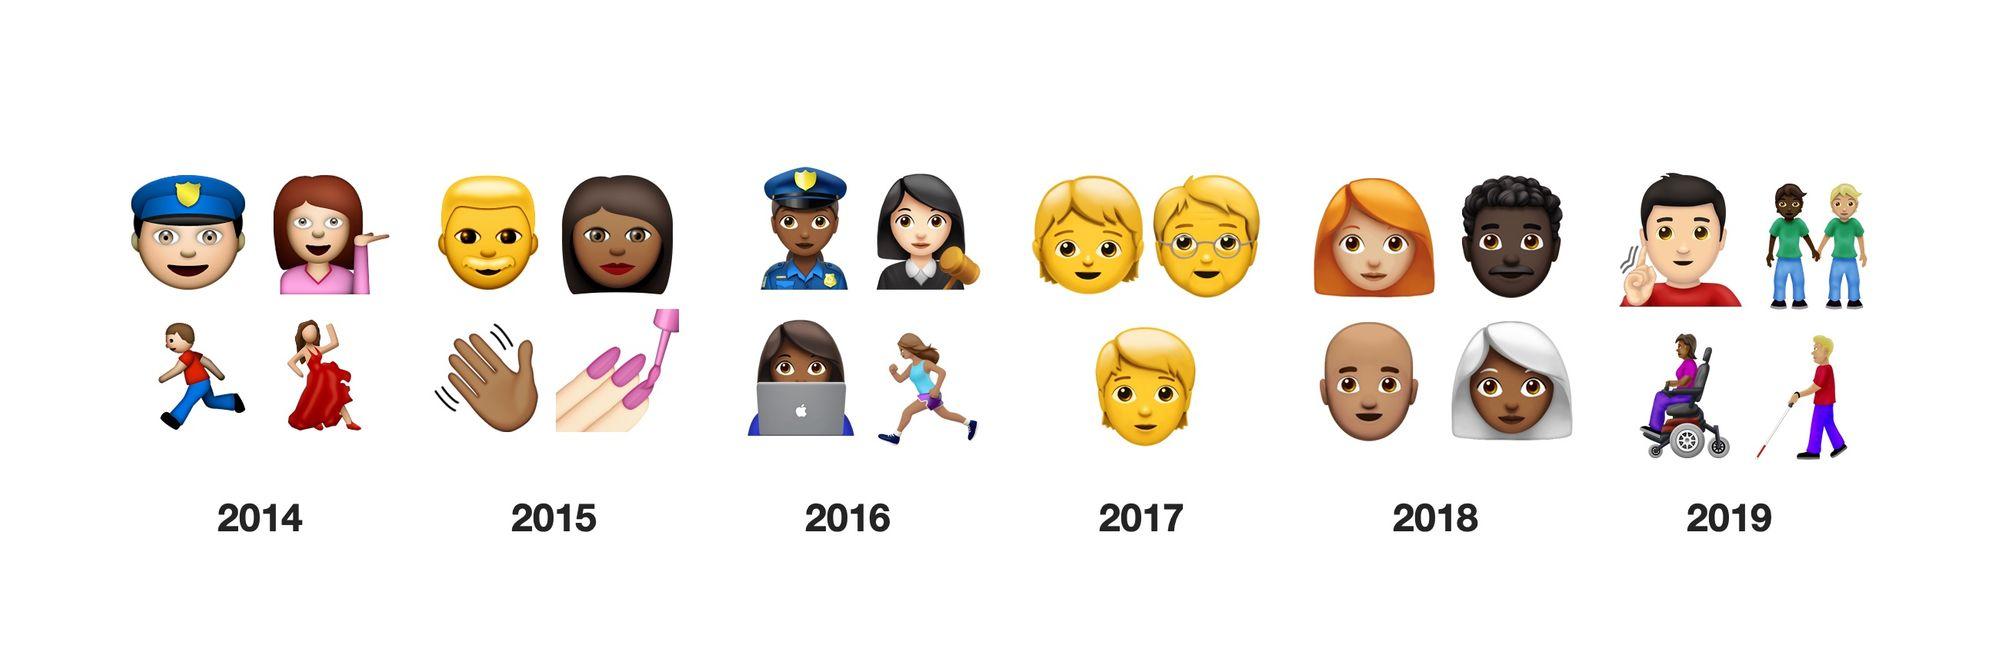 emojipedia-timeline-2014-2019